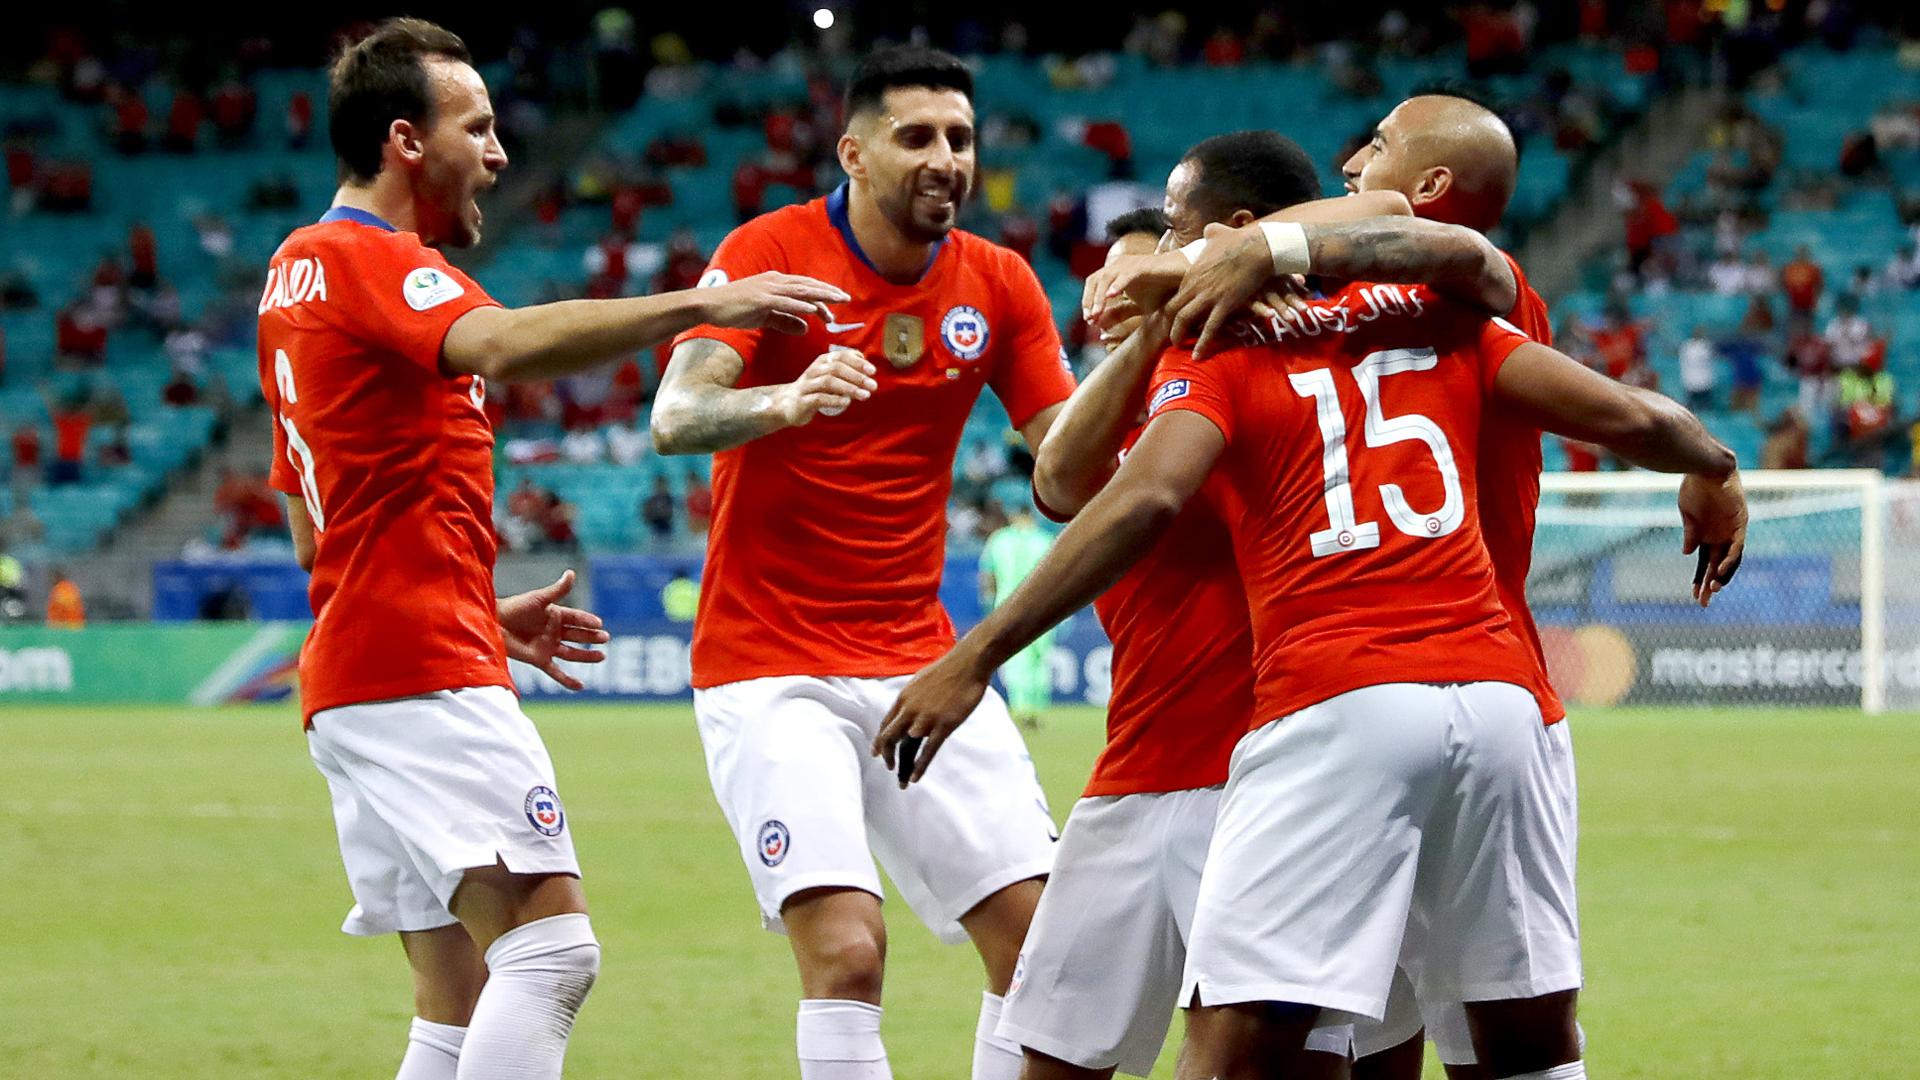 Ecuador 1 Chile 2: Sanchez scores winner as Copa holders progress